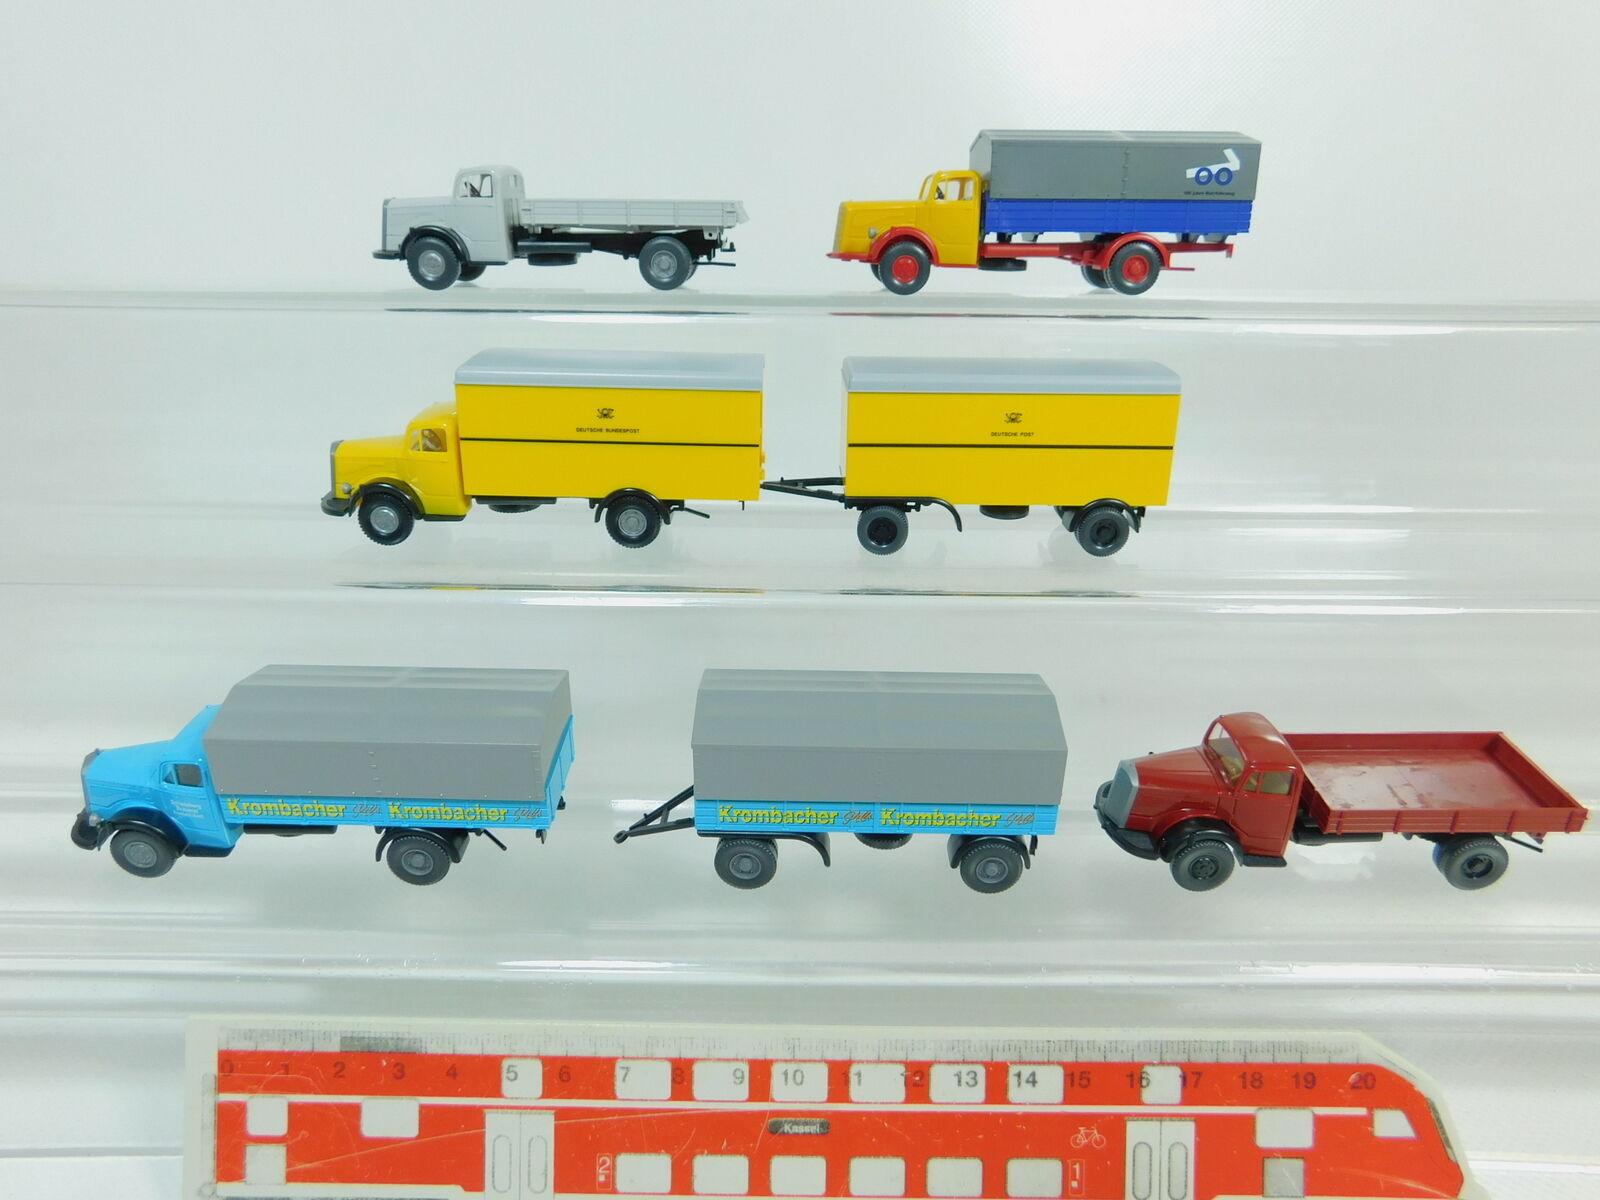 BO469-0,5x Wiking H0 H0 H0 1 87 LKW Mercedes-Benz MB L 3500  Post + Krombacher etc 2ee1b3